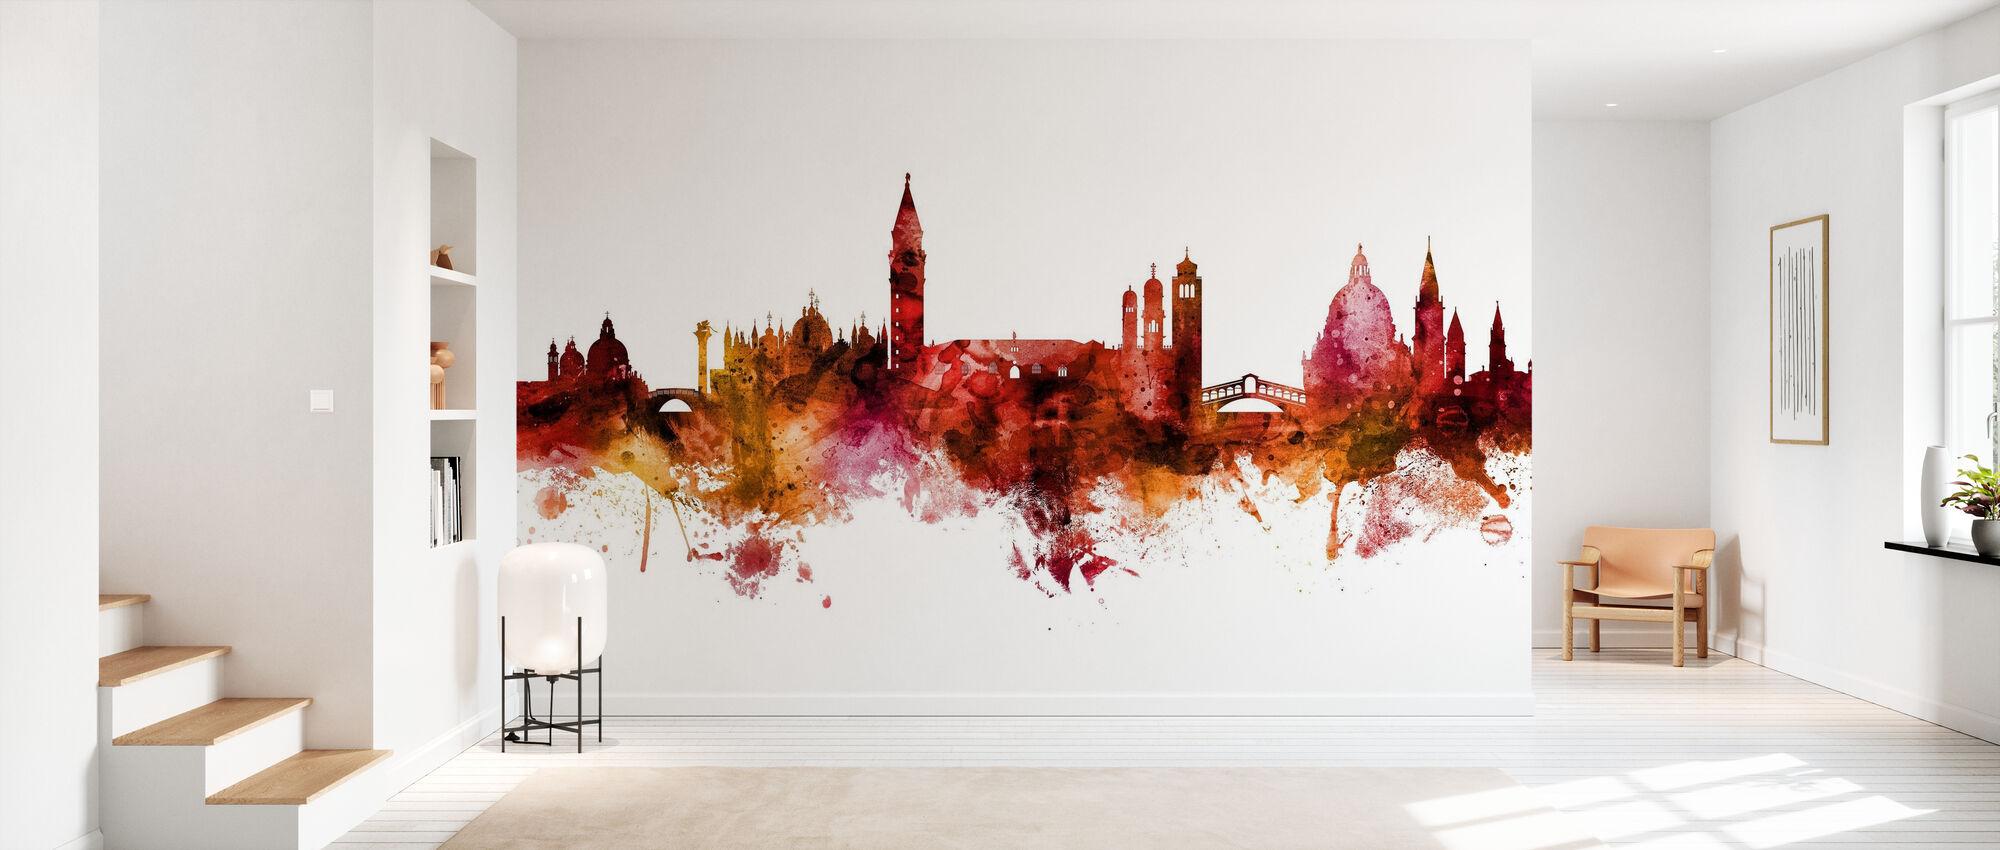 Venice Italy Skyline - Wallpaper - Hallway